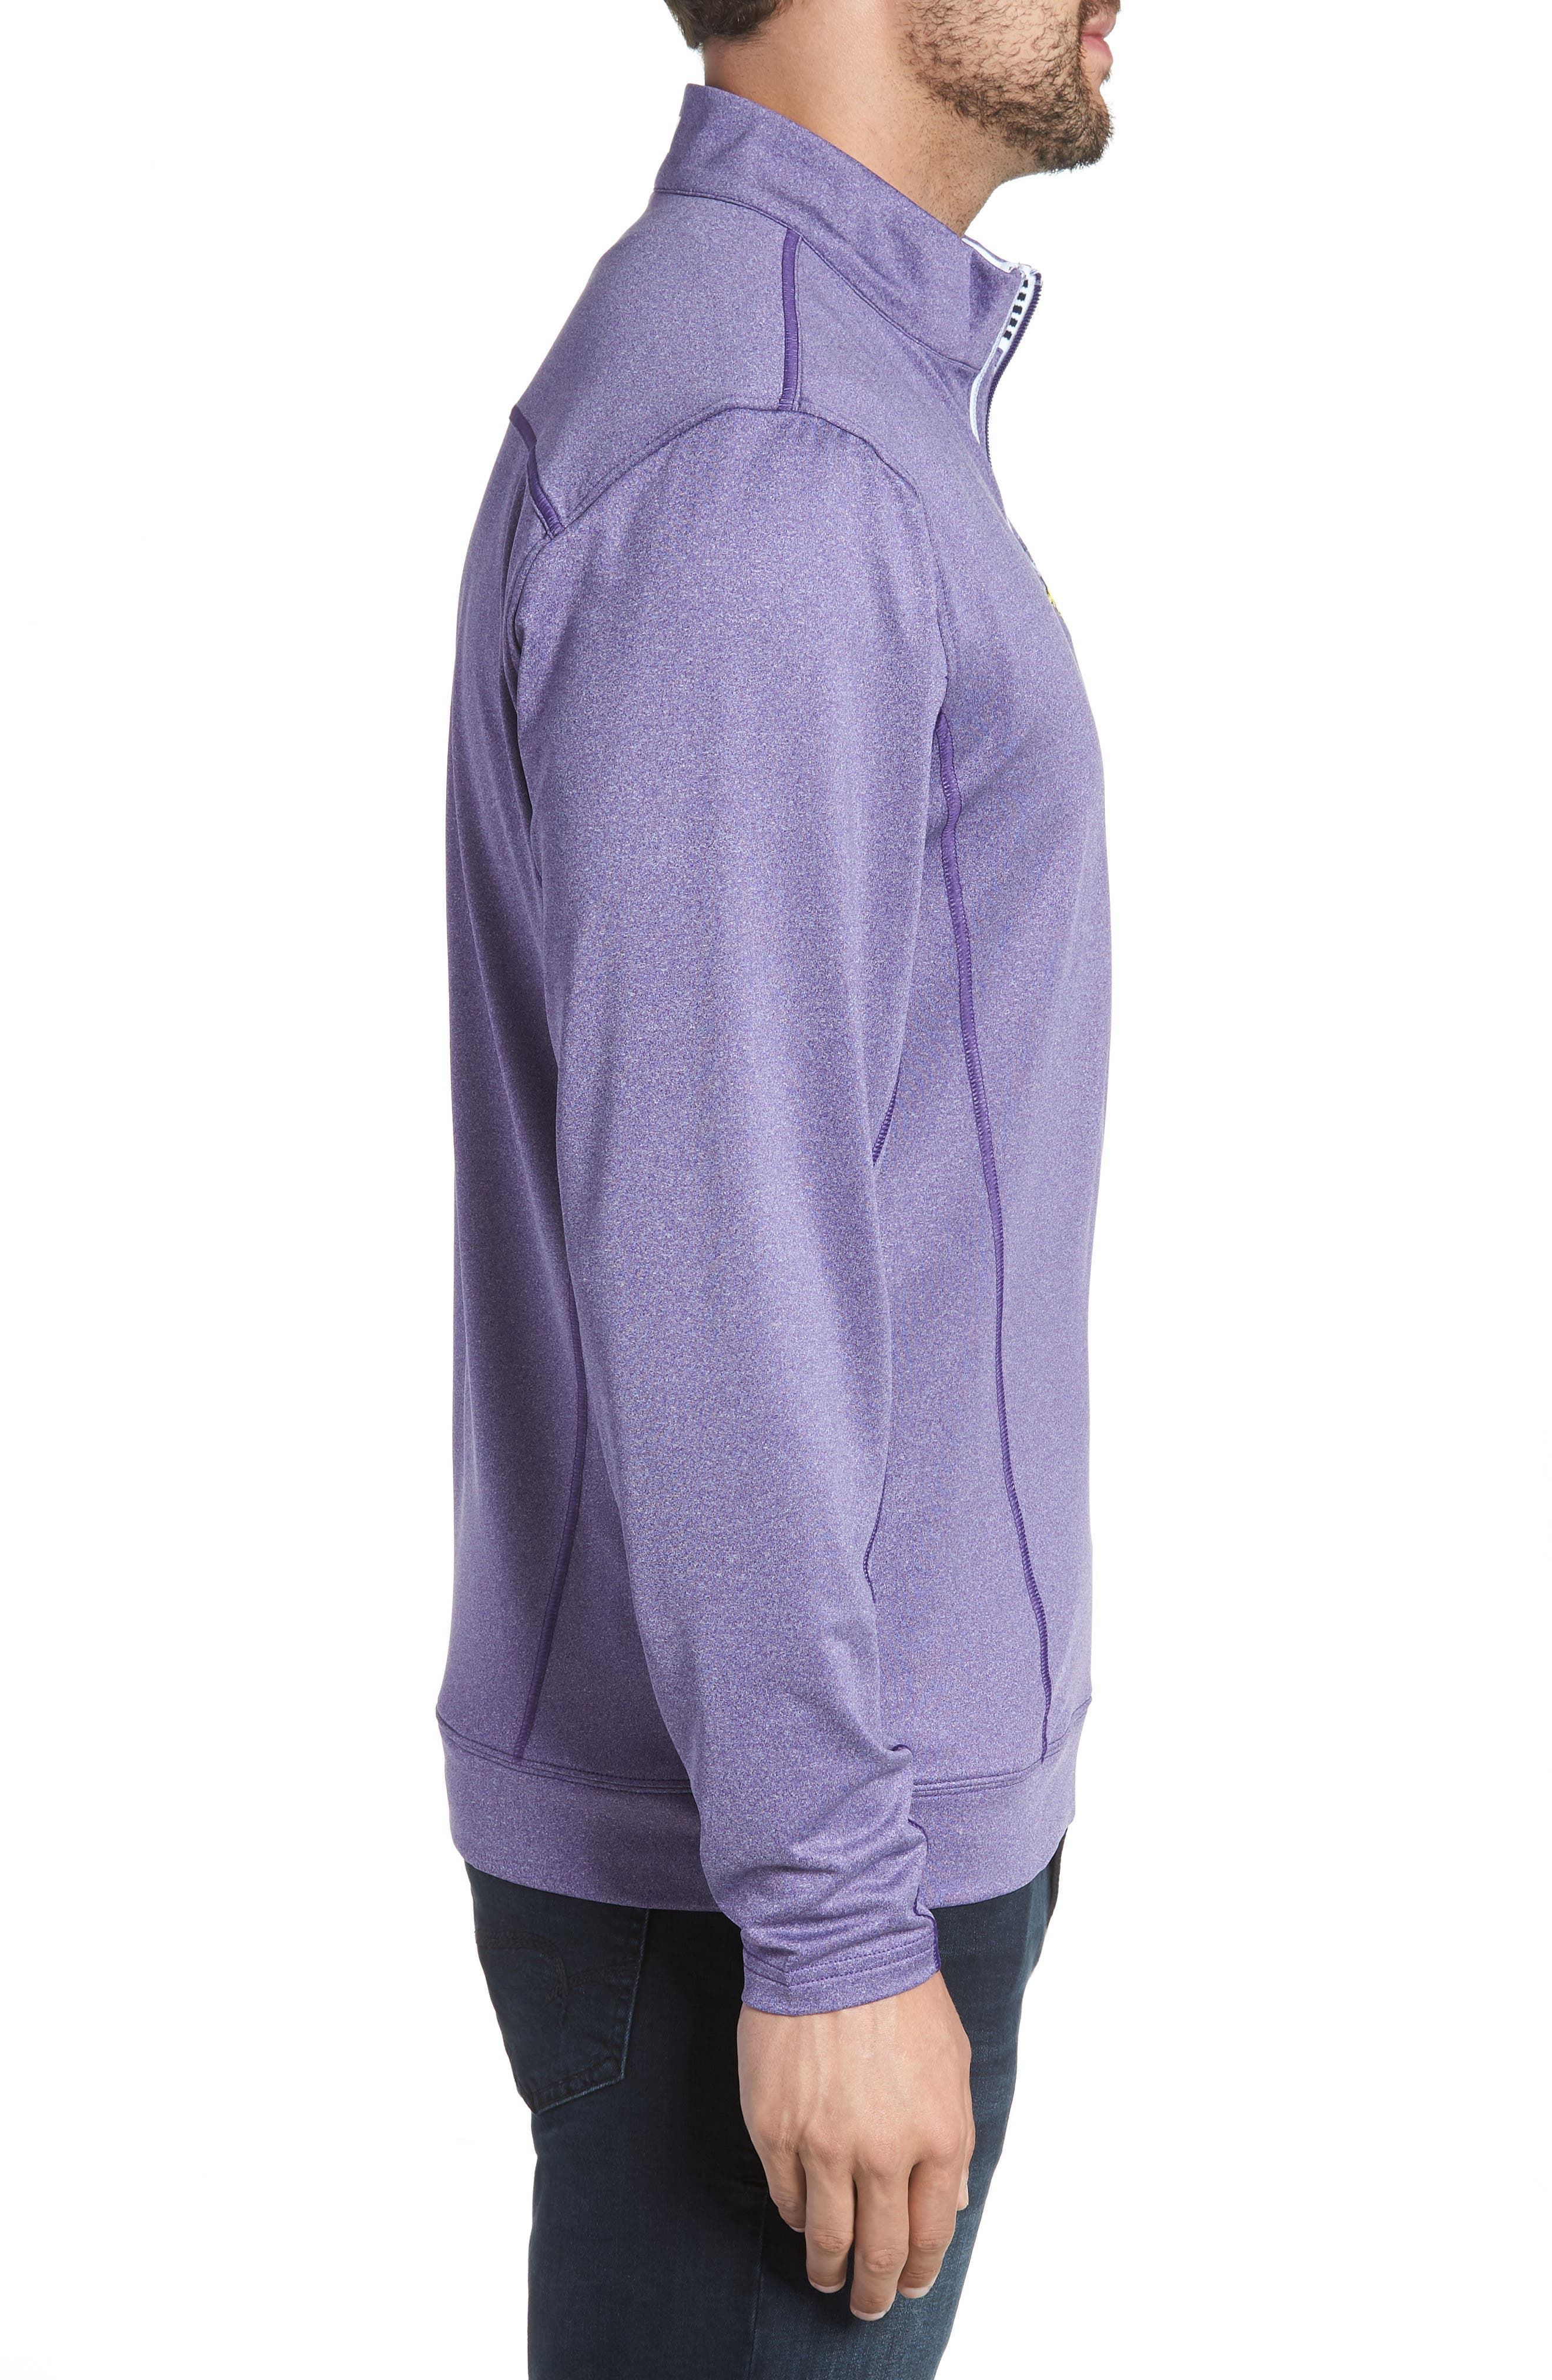 Endurance Minnesota Vikings Regular Fit Pullover,                             Alternate thumbnail 3, color,                             COLLEGE PURPLE HEATHER